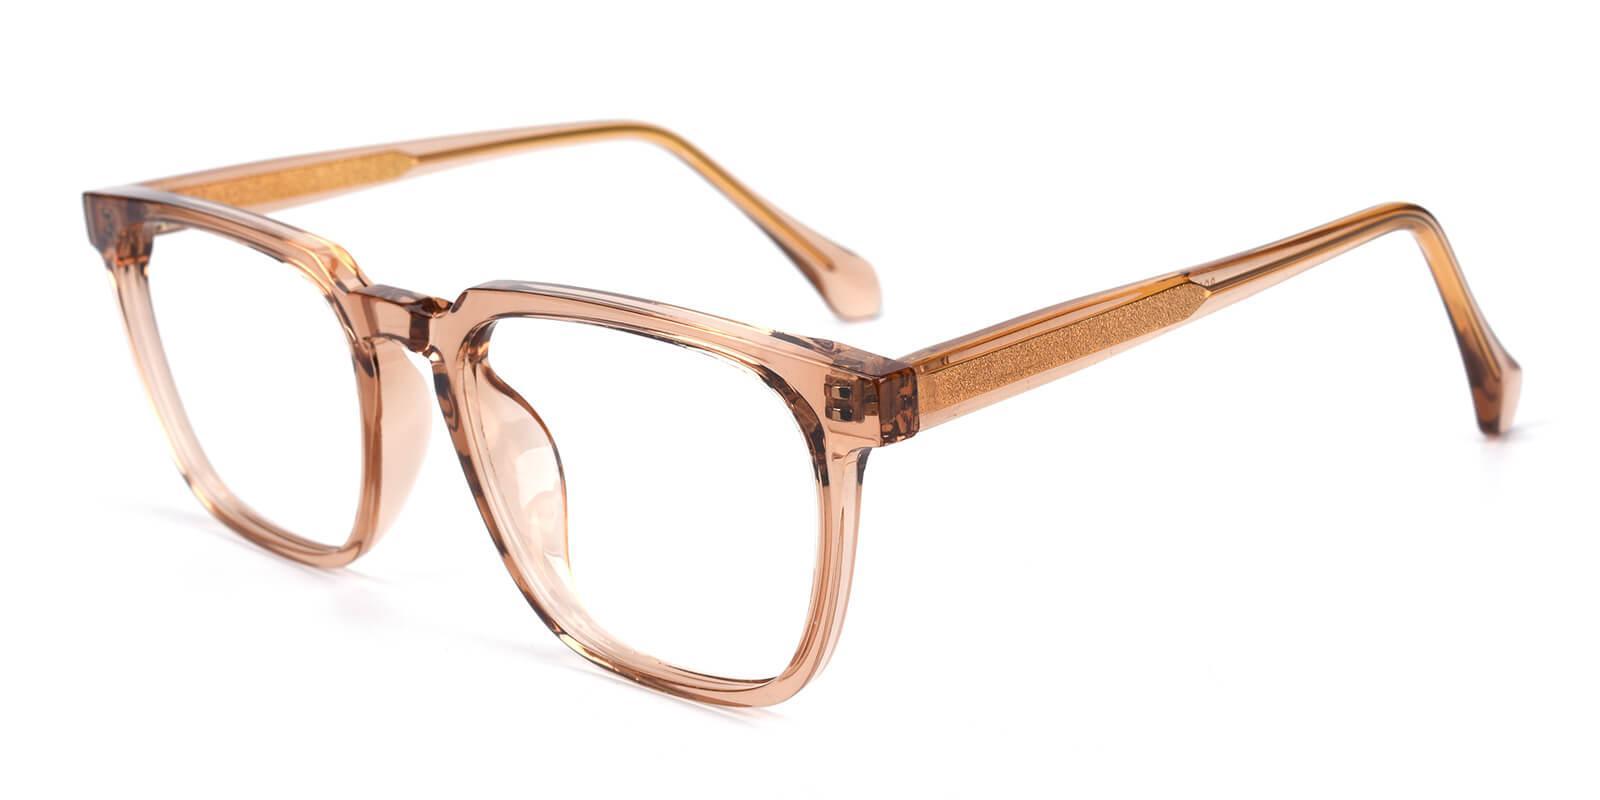 Gekay-Yellow-Square-Acetate-Eyeglasses-additional1